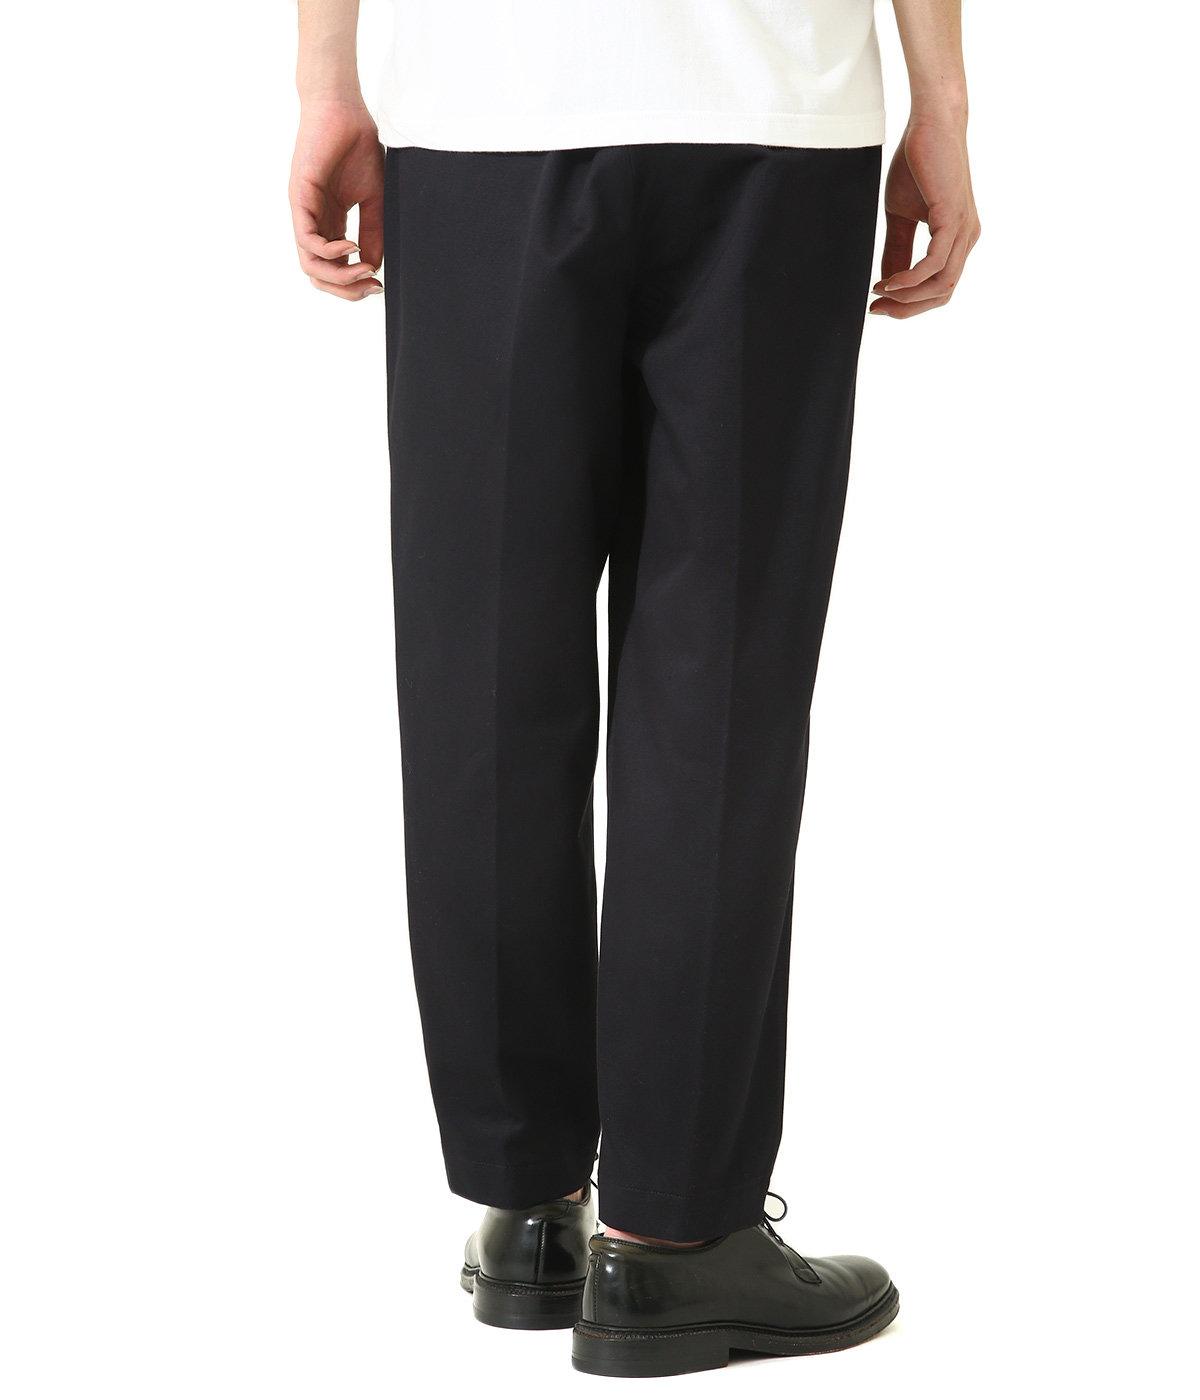 San Joaquin Cotton Chino Drawstring Trousers